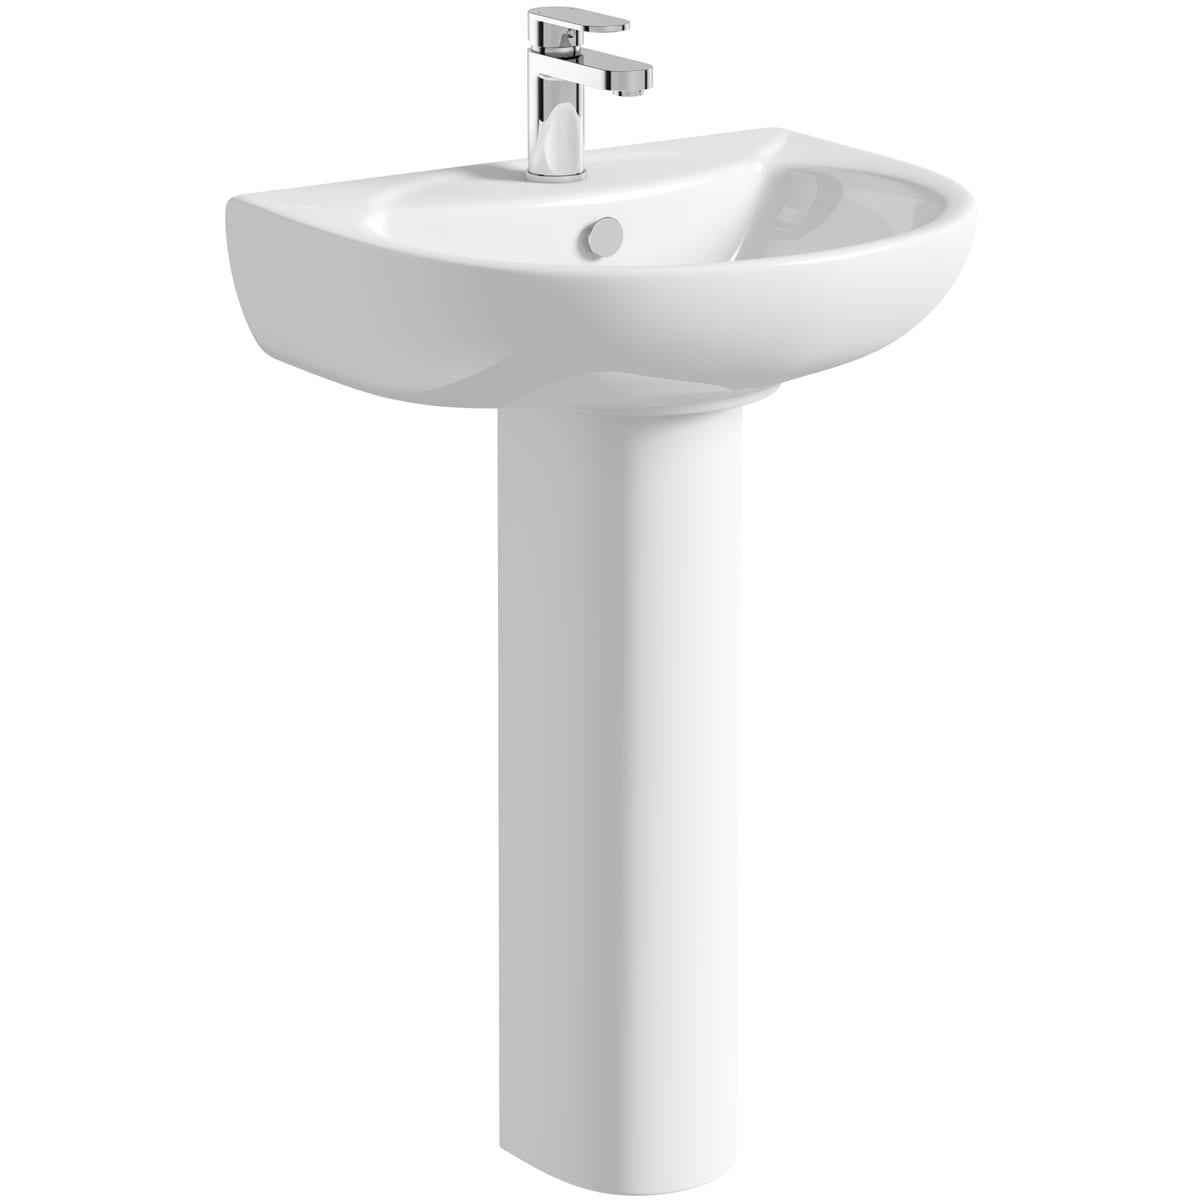 Orchard modern 1 tap hole full pedestal basin 540mm